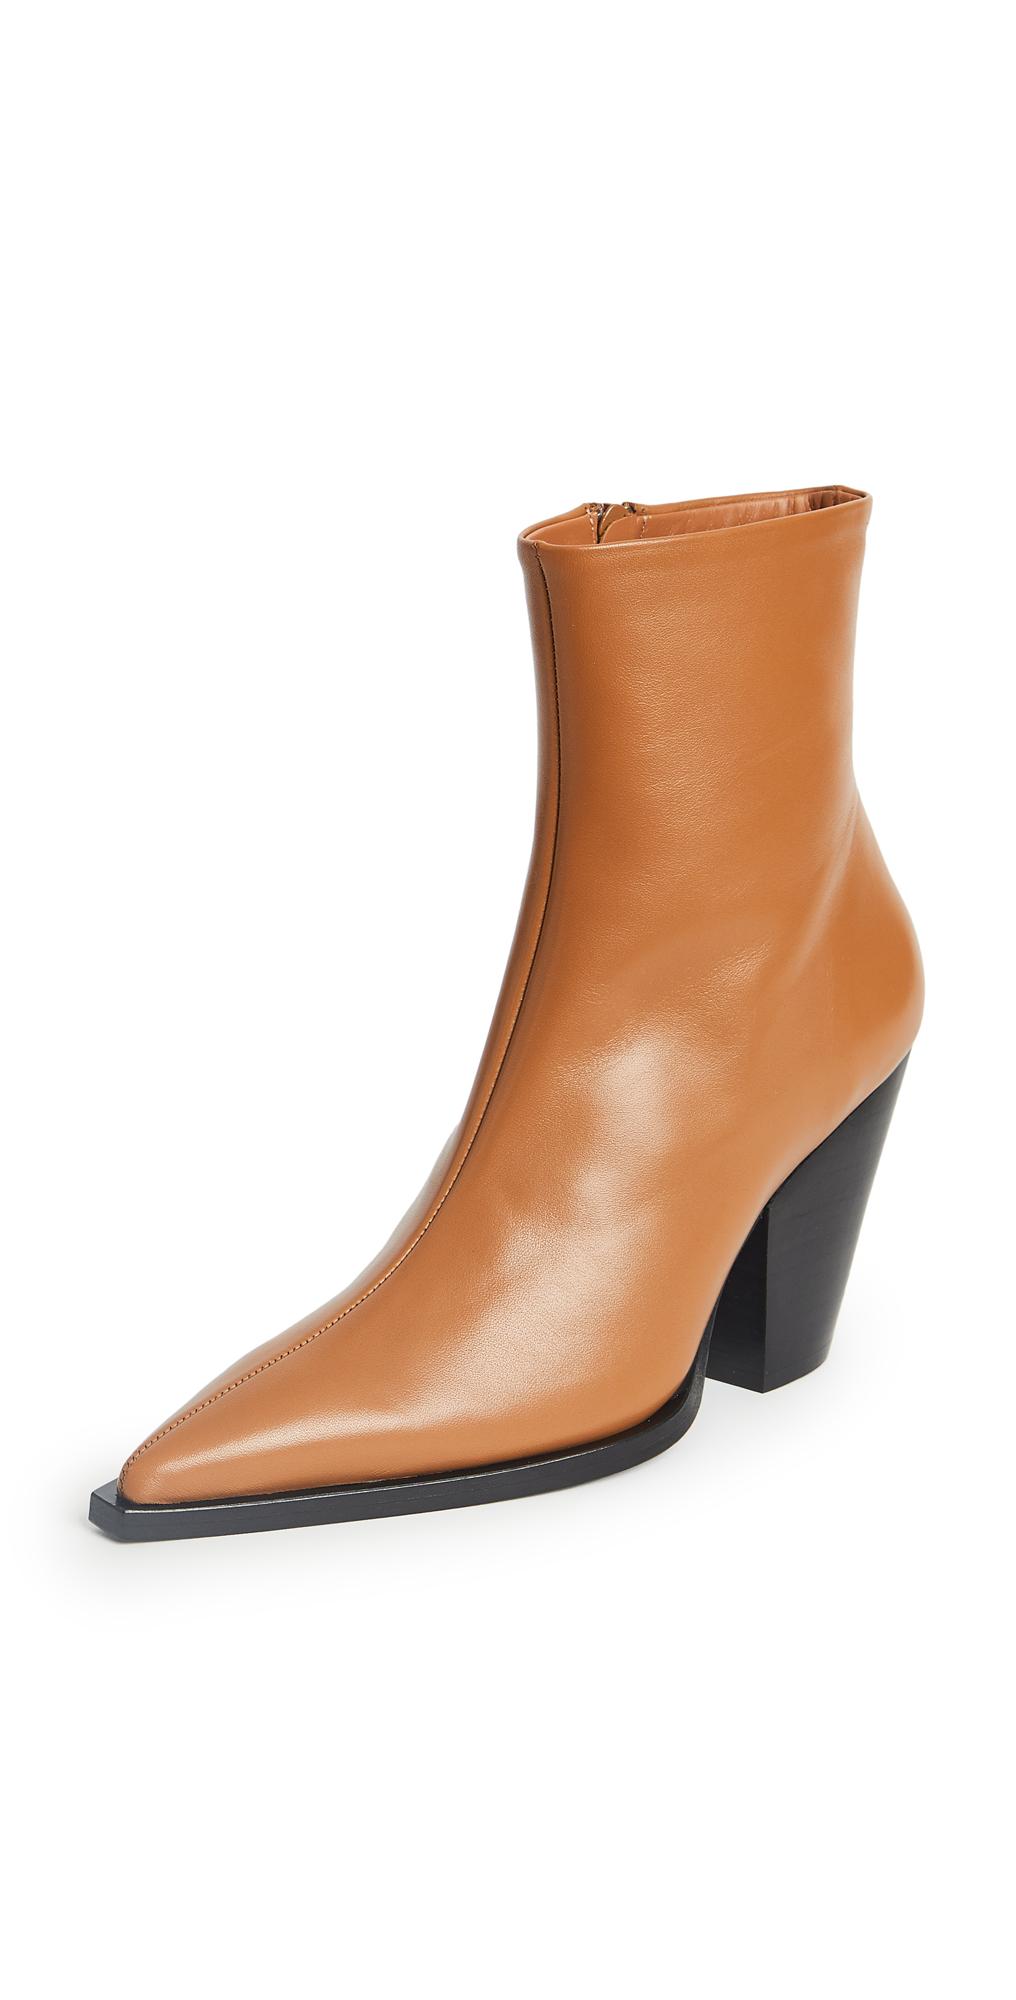 Simon Miller Pack Boots